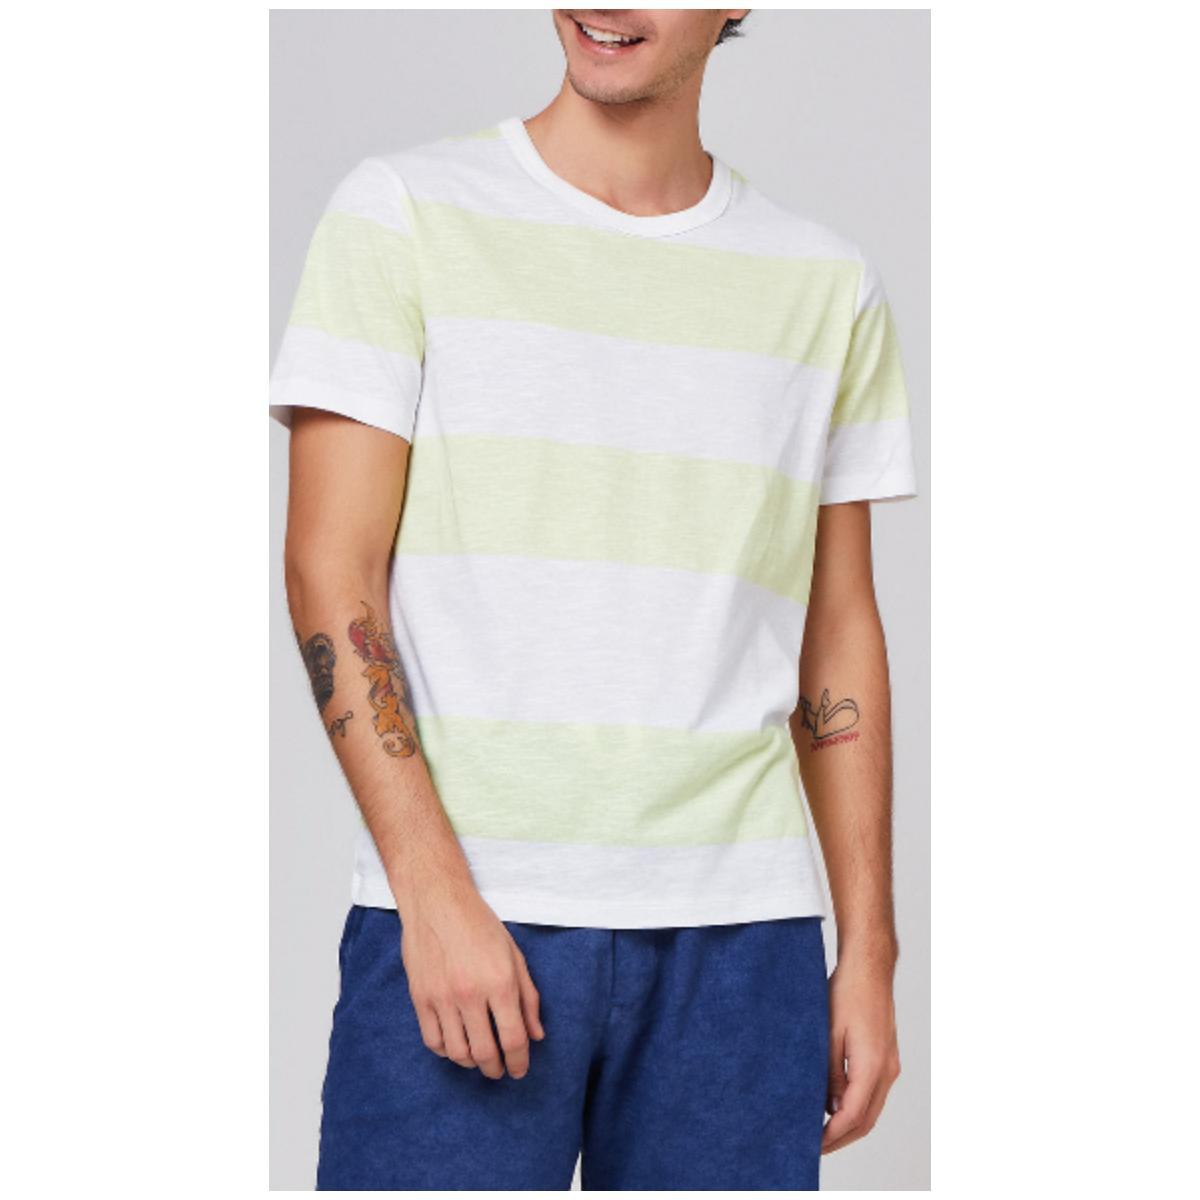 Camiseta Masculina Hering 4eux 1aen Branco/verde